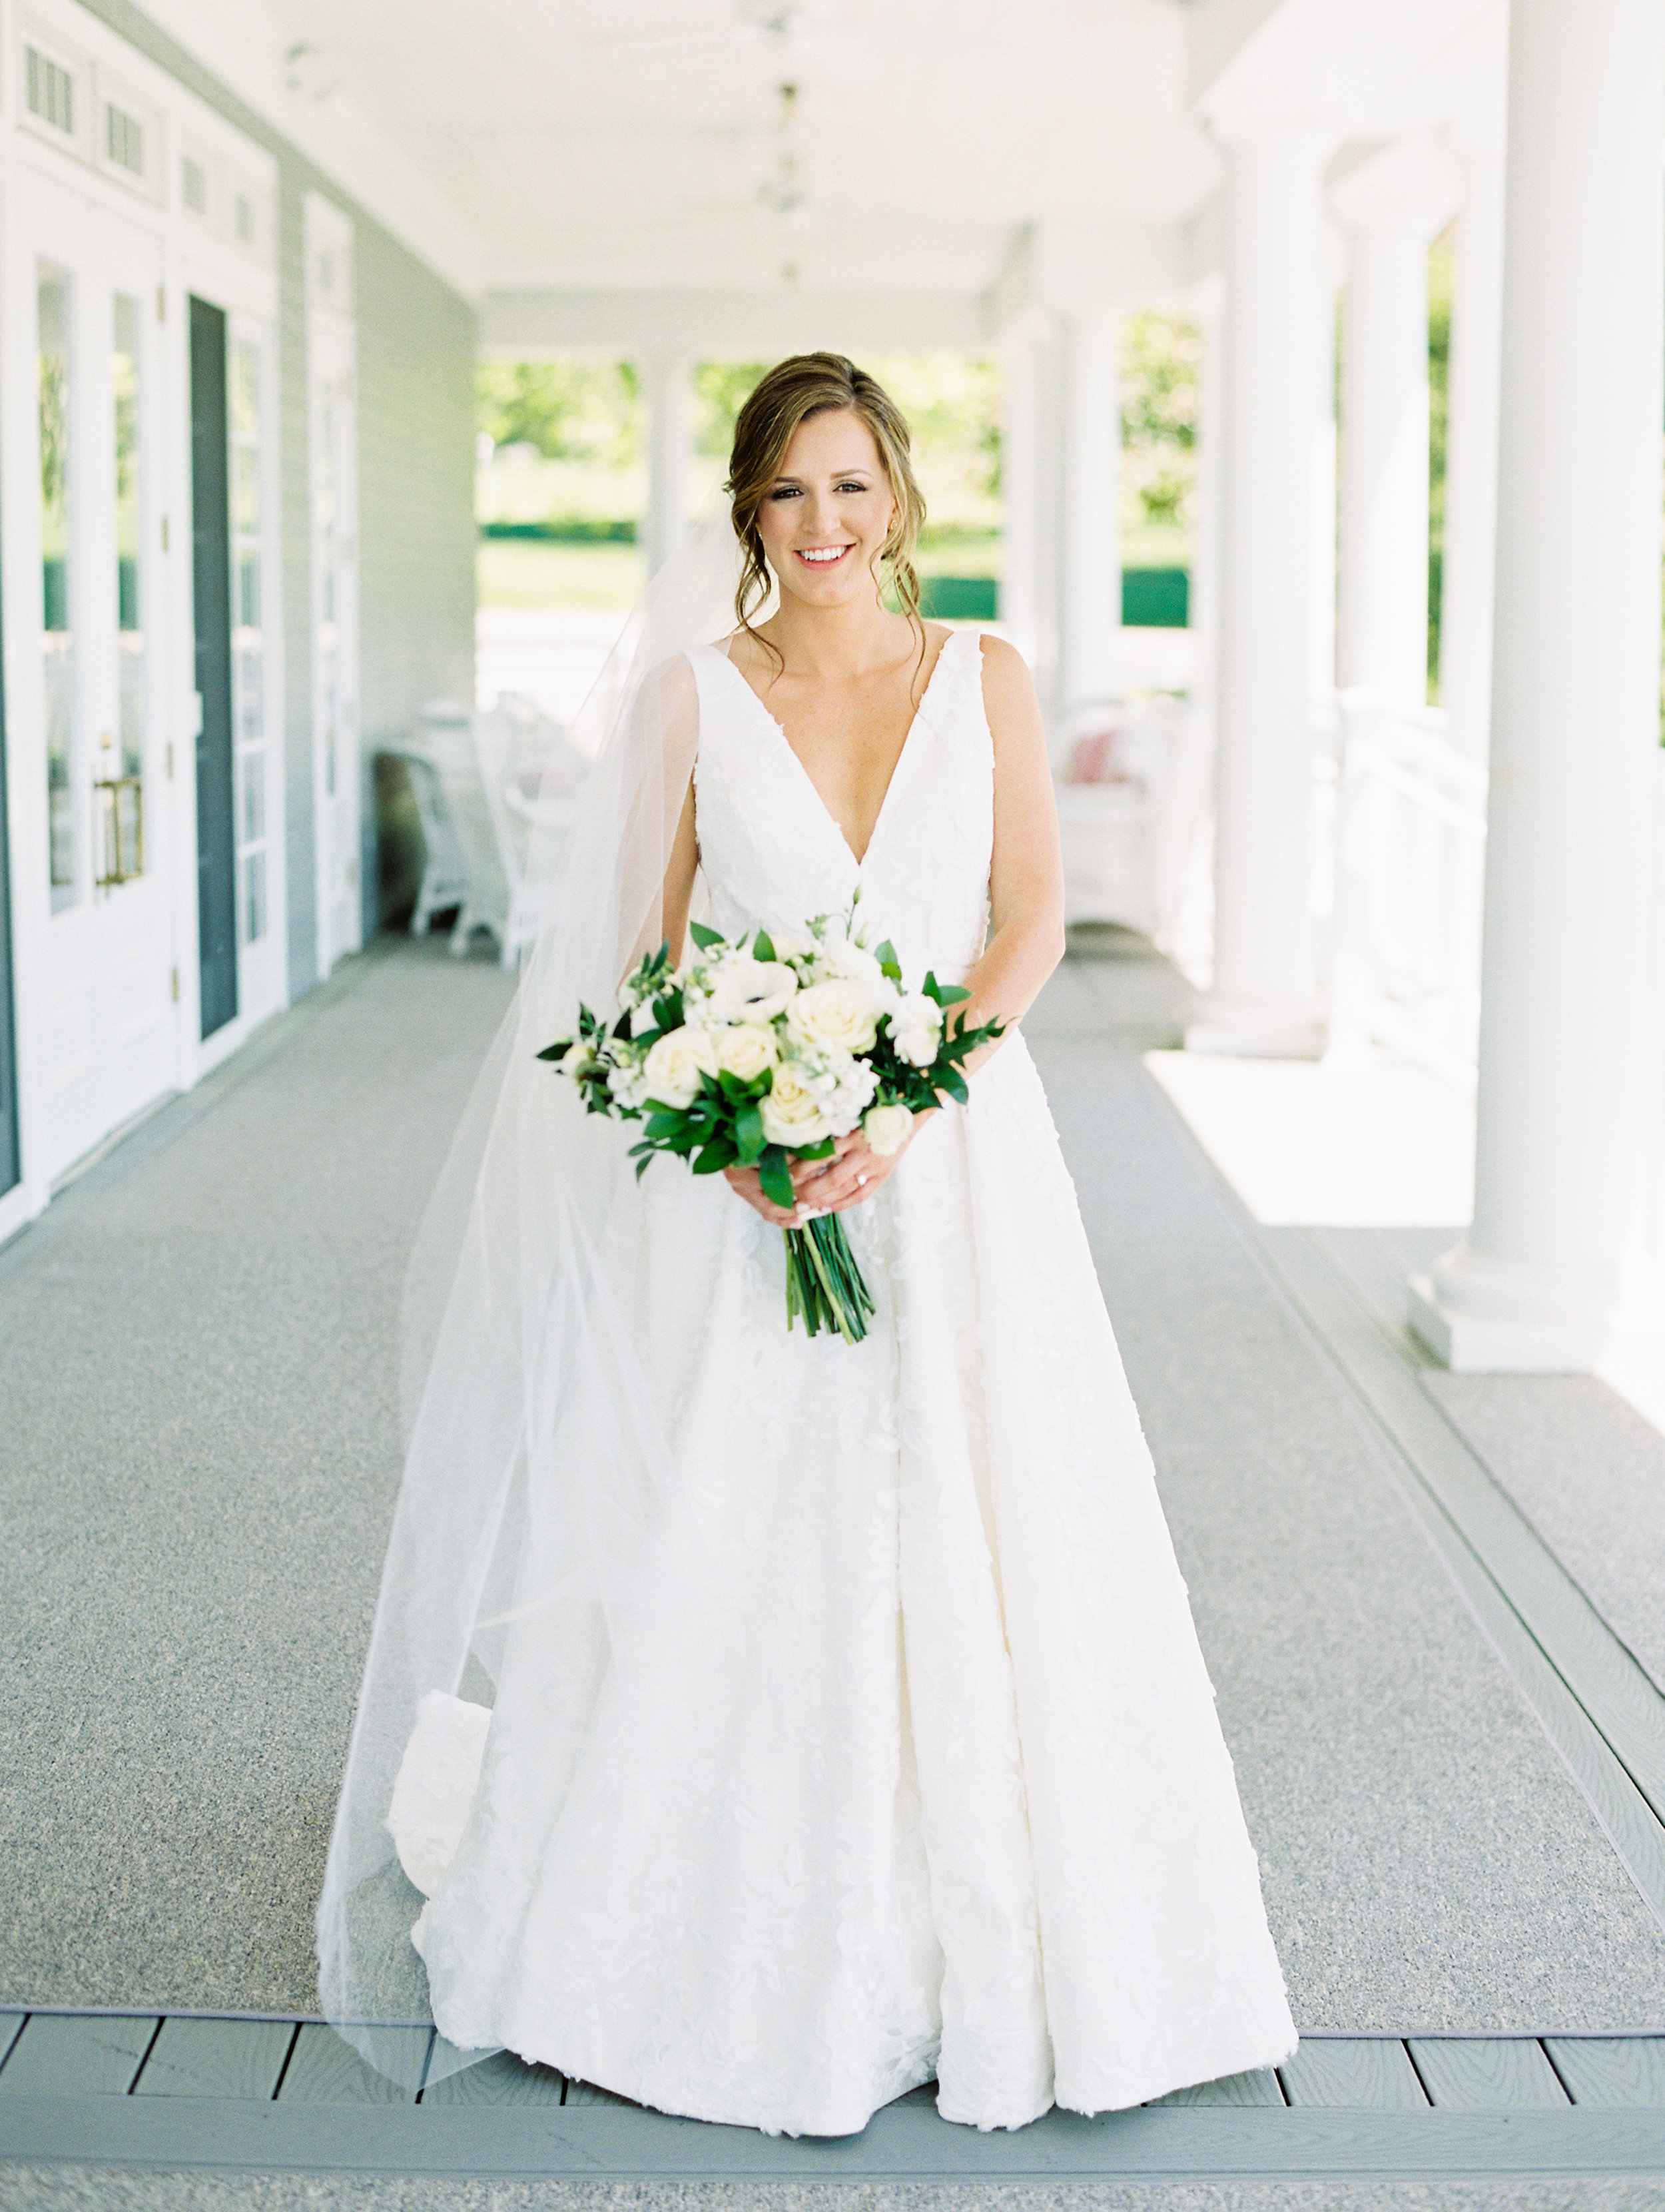 DeGuilio+Wedding+First+Lookf-6 copy.jpg